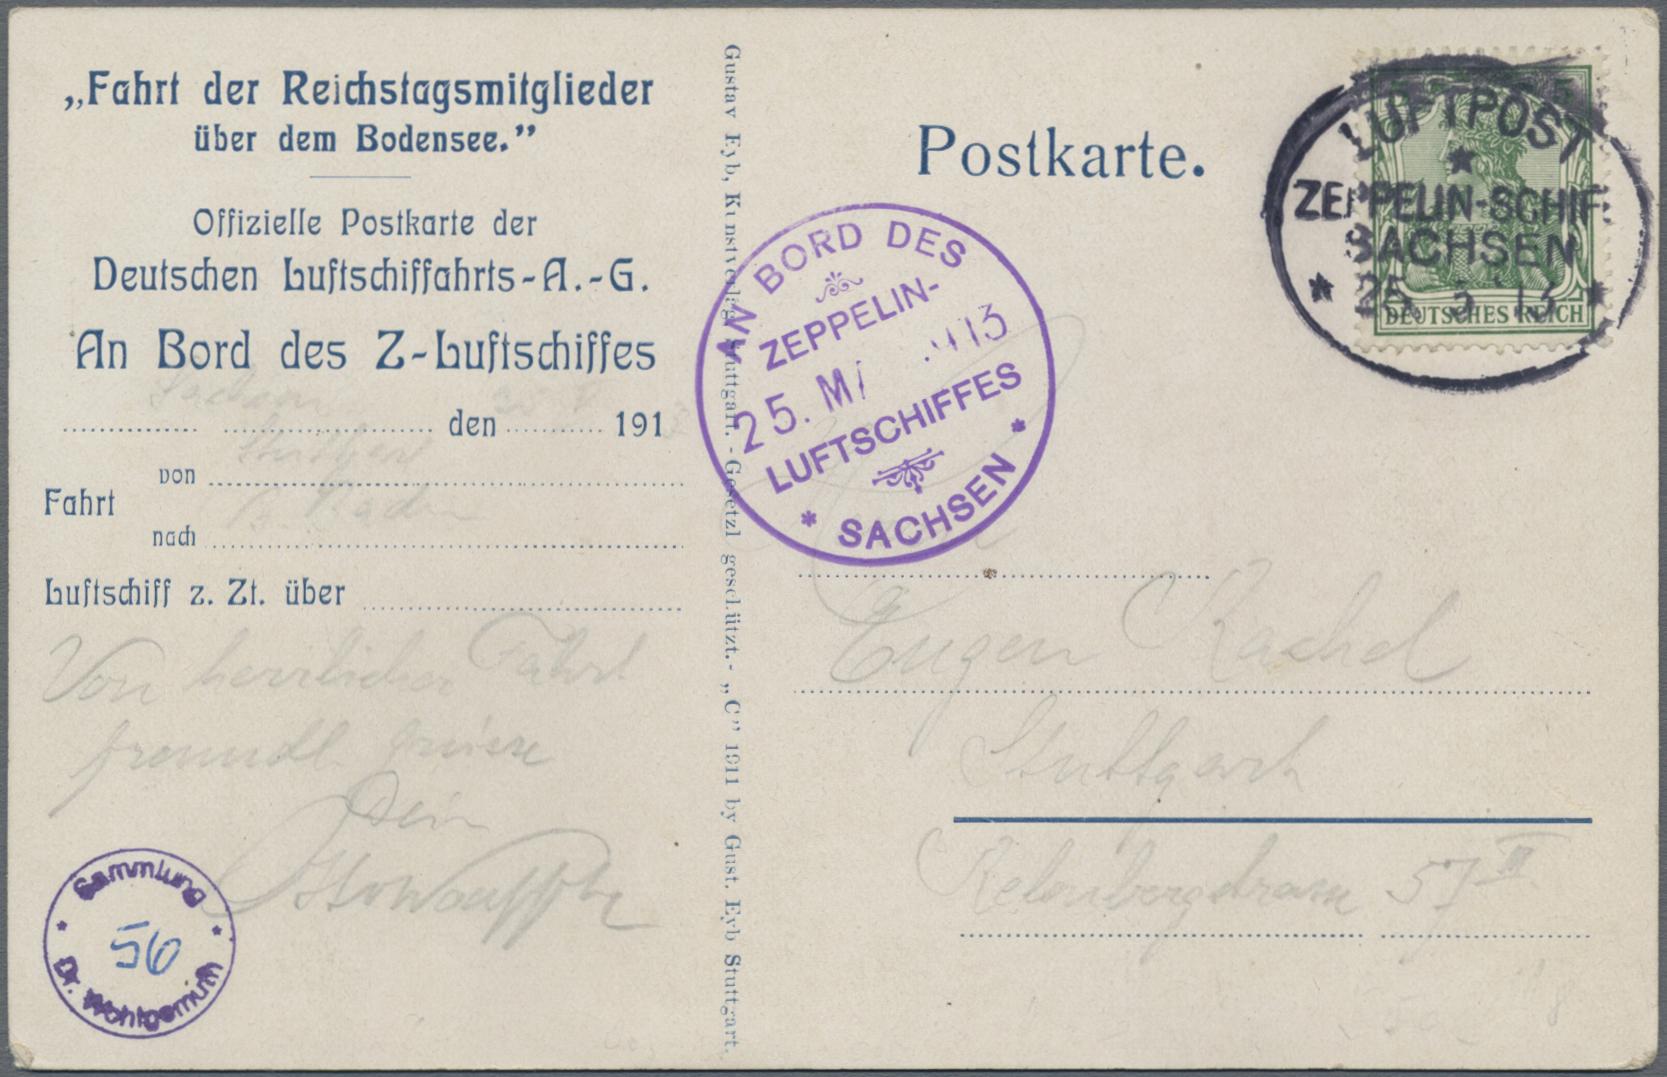 Lot 08518A - zeppelinpost deutschland  -  Auktionshaus Christoph Gärtner GmbH & Co. KG 50th Auction Anniversary Auction - Day 3